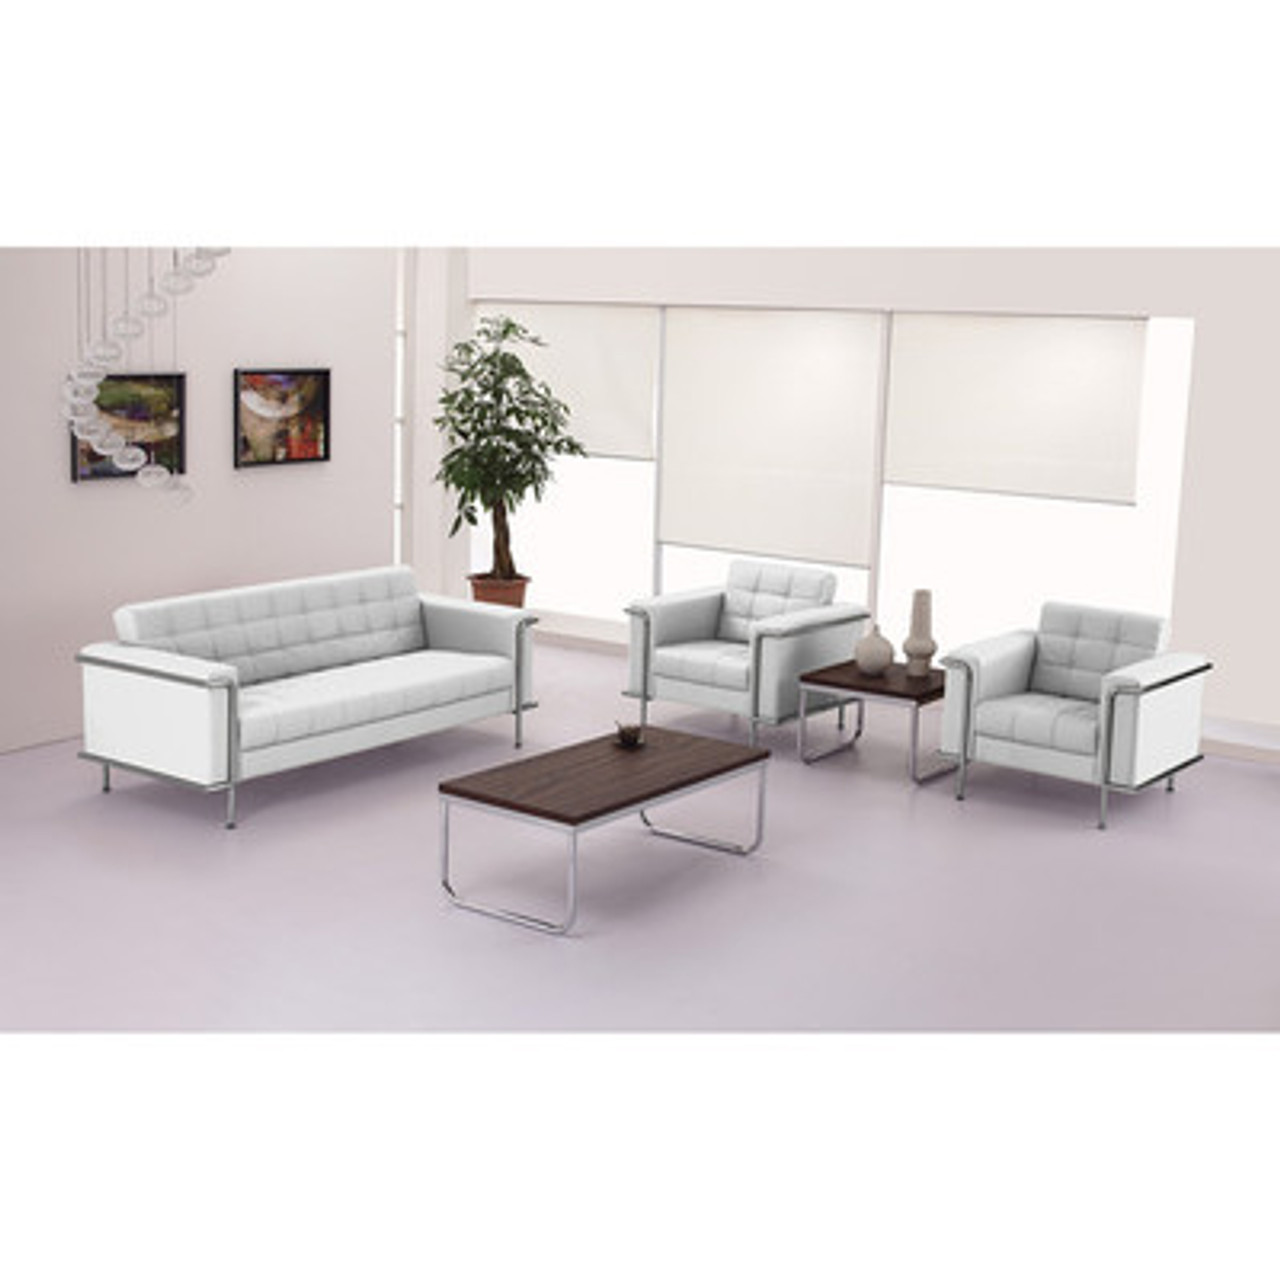 3pc Modern Leather Office Reception Sofa Set, FF-0447-12-S1